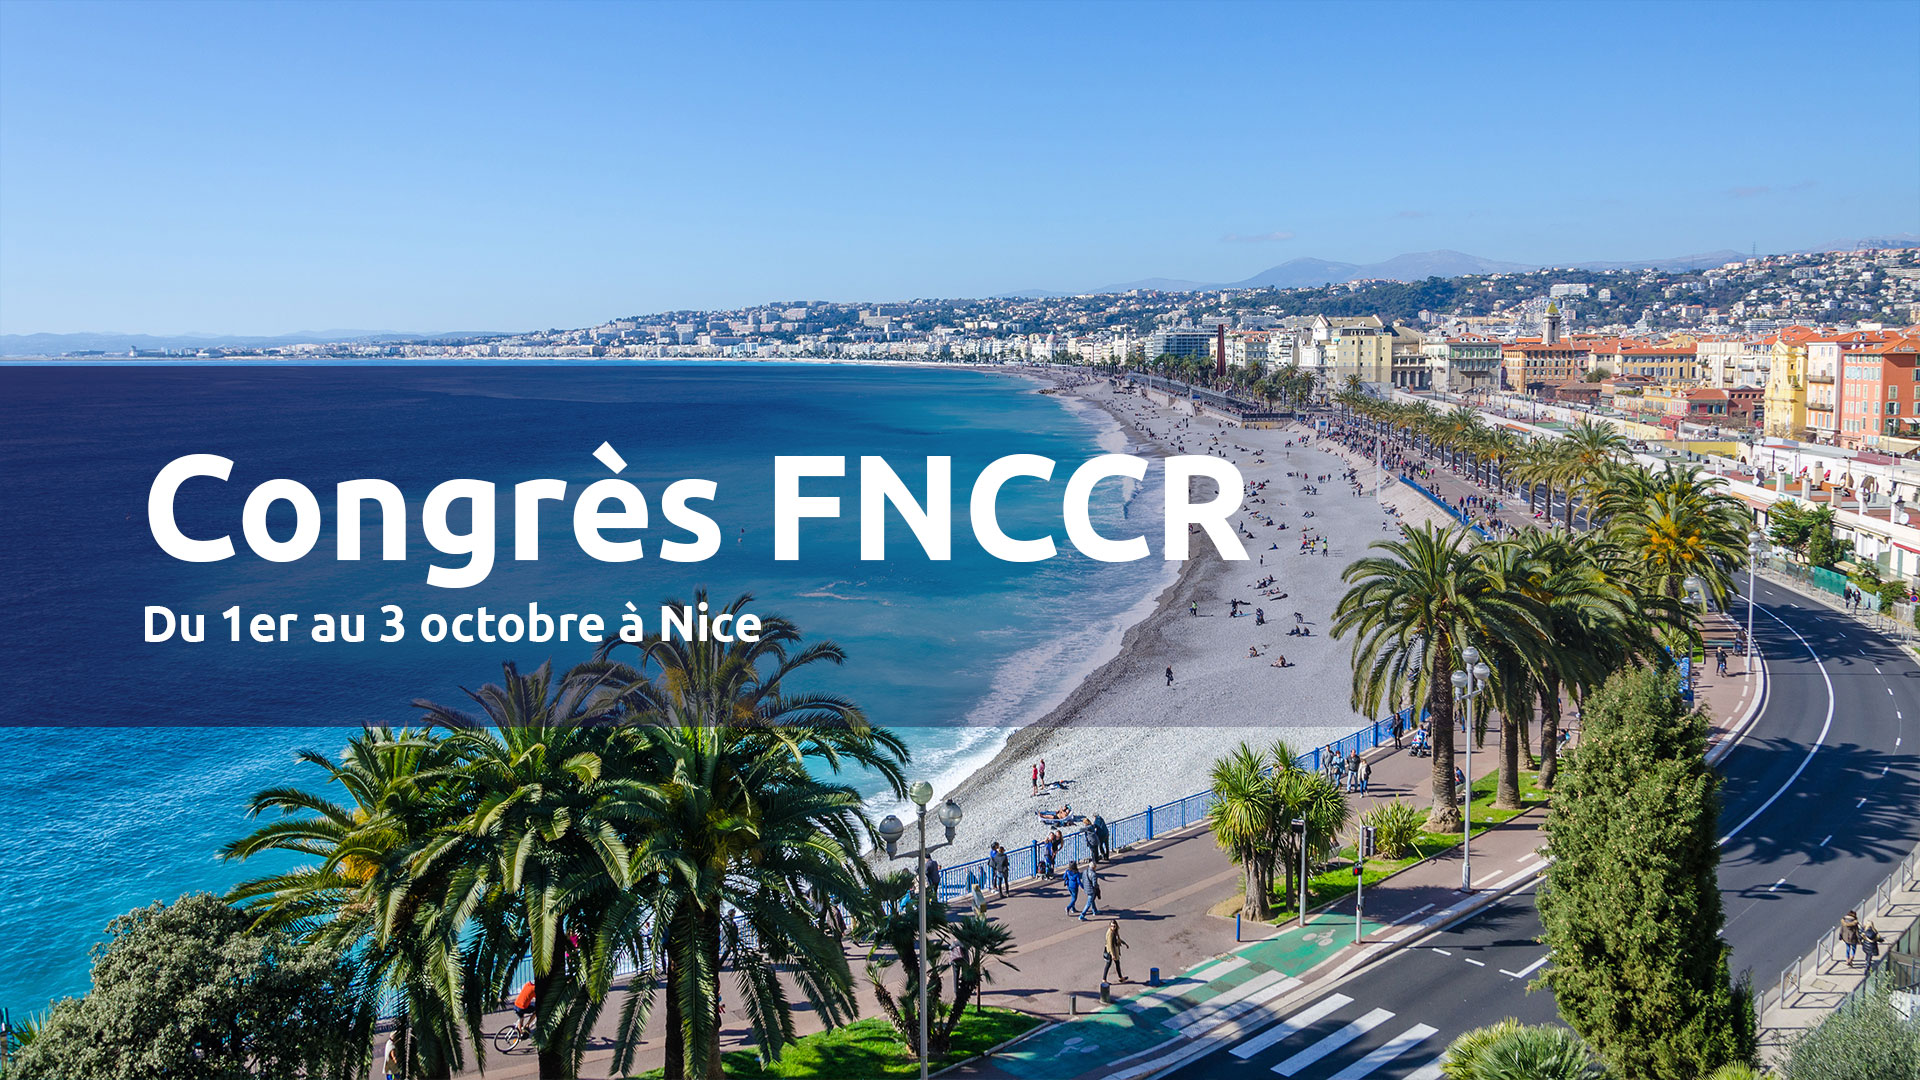 Congrès-FNCCR-Nice-octobre-2019-MGDIS